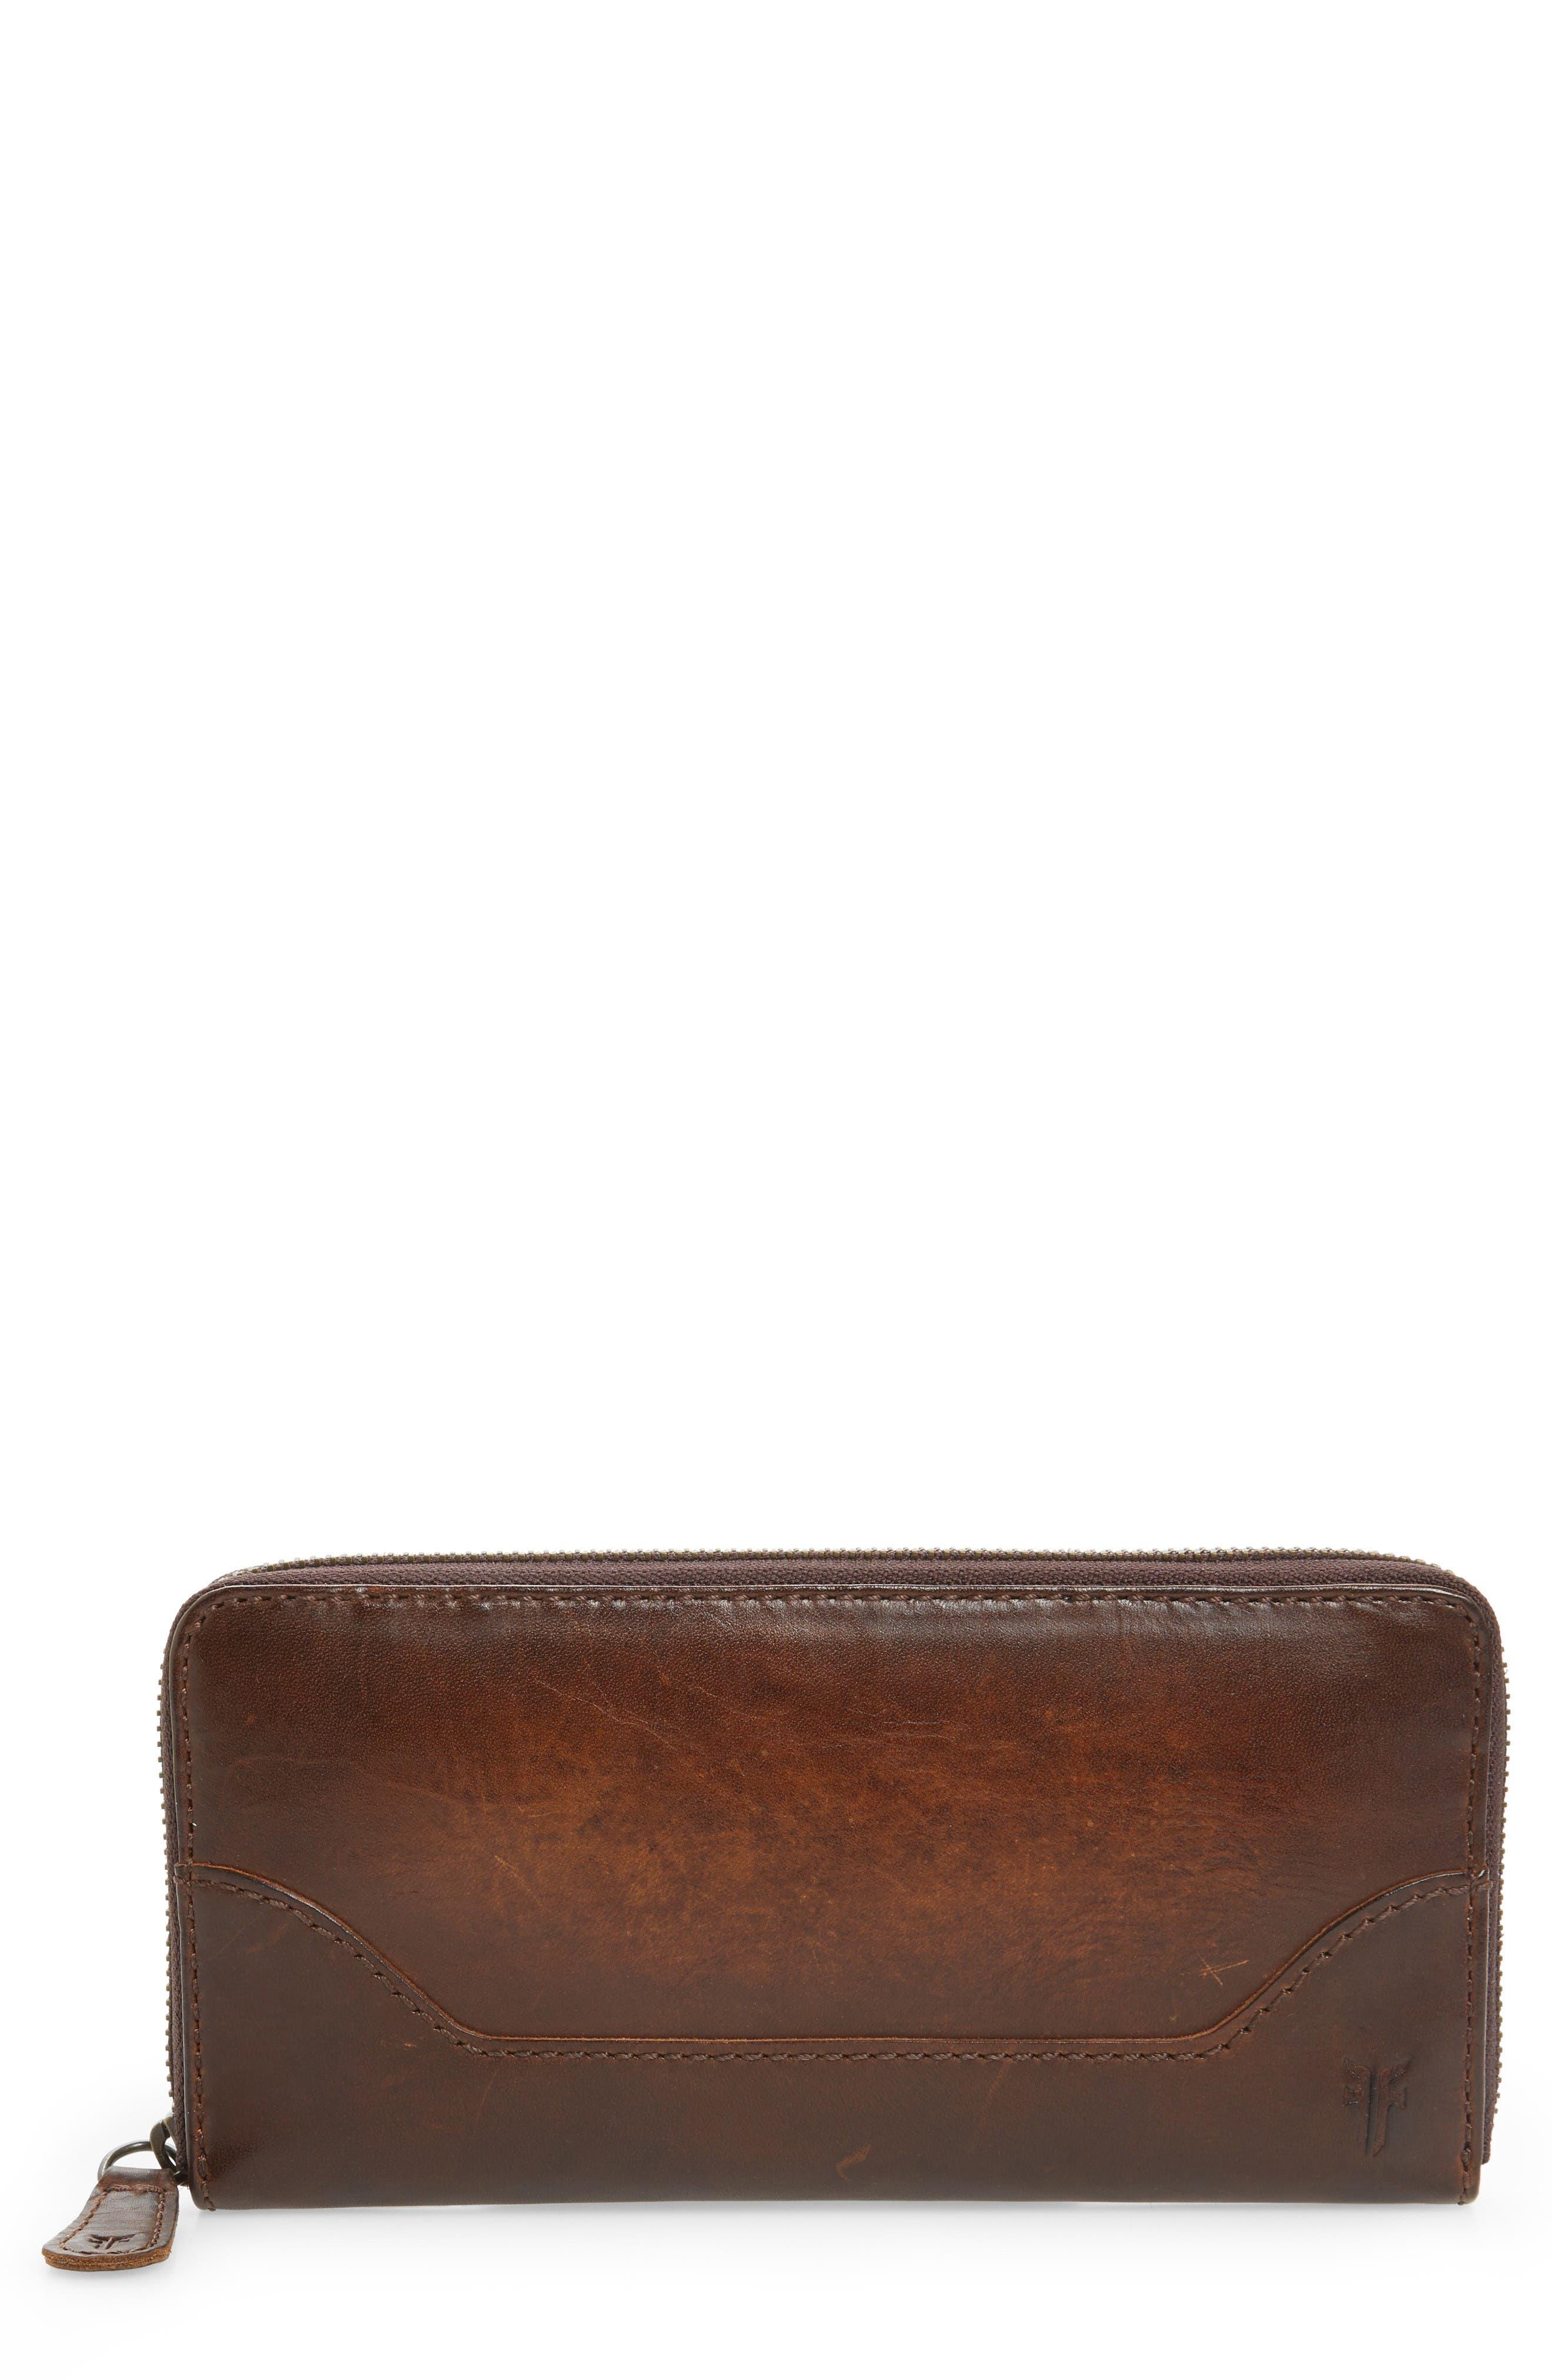 Main Image - Frye Melissa Leather Wallet